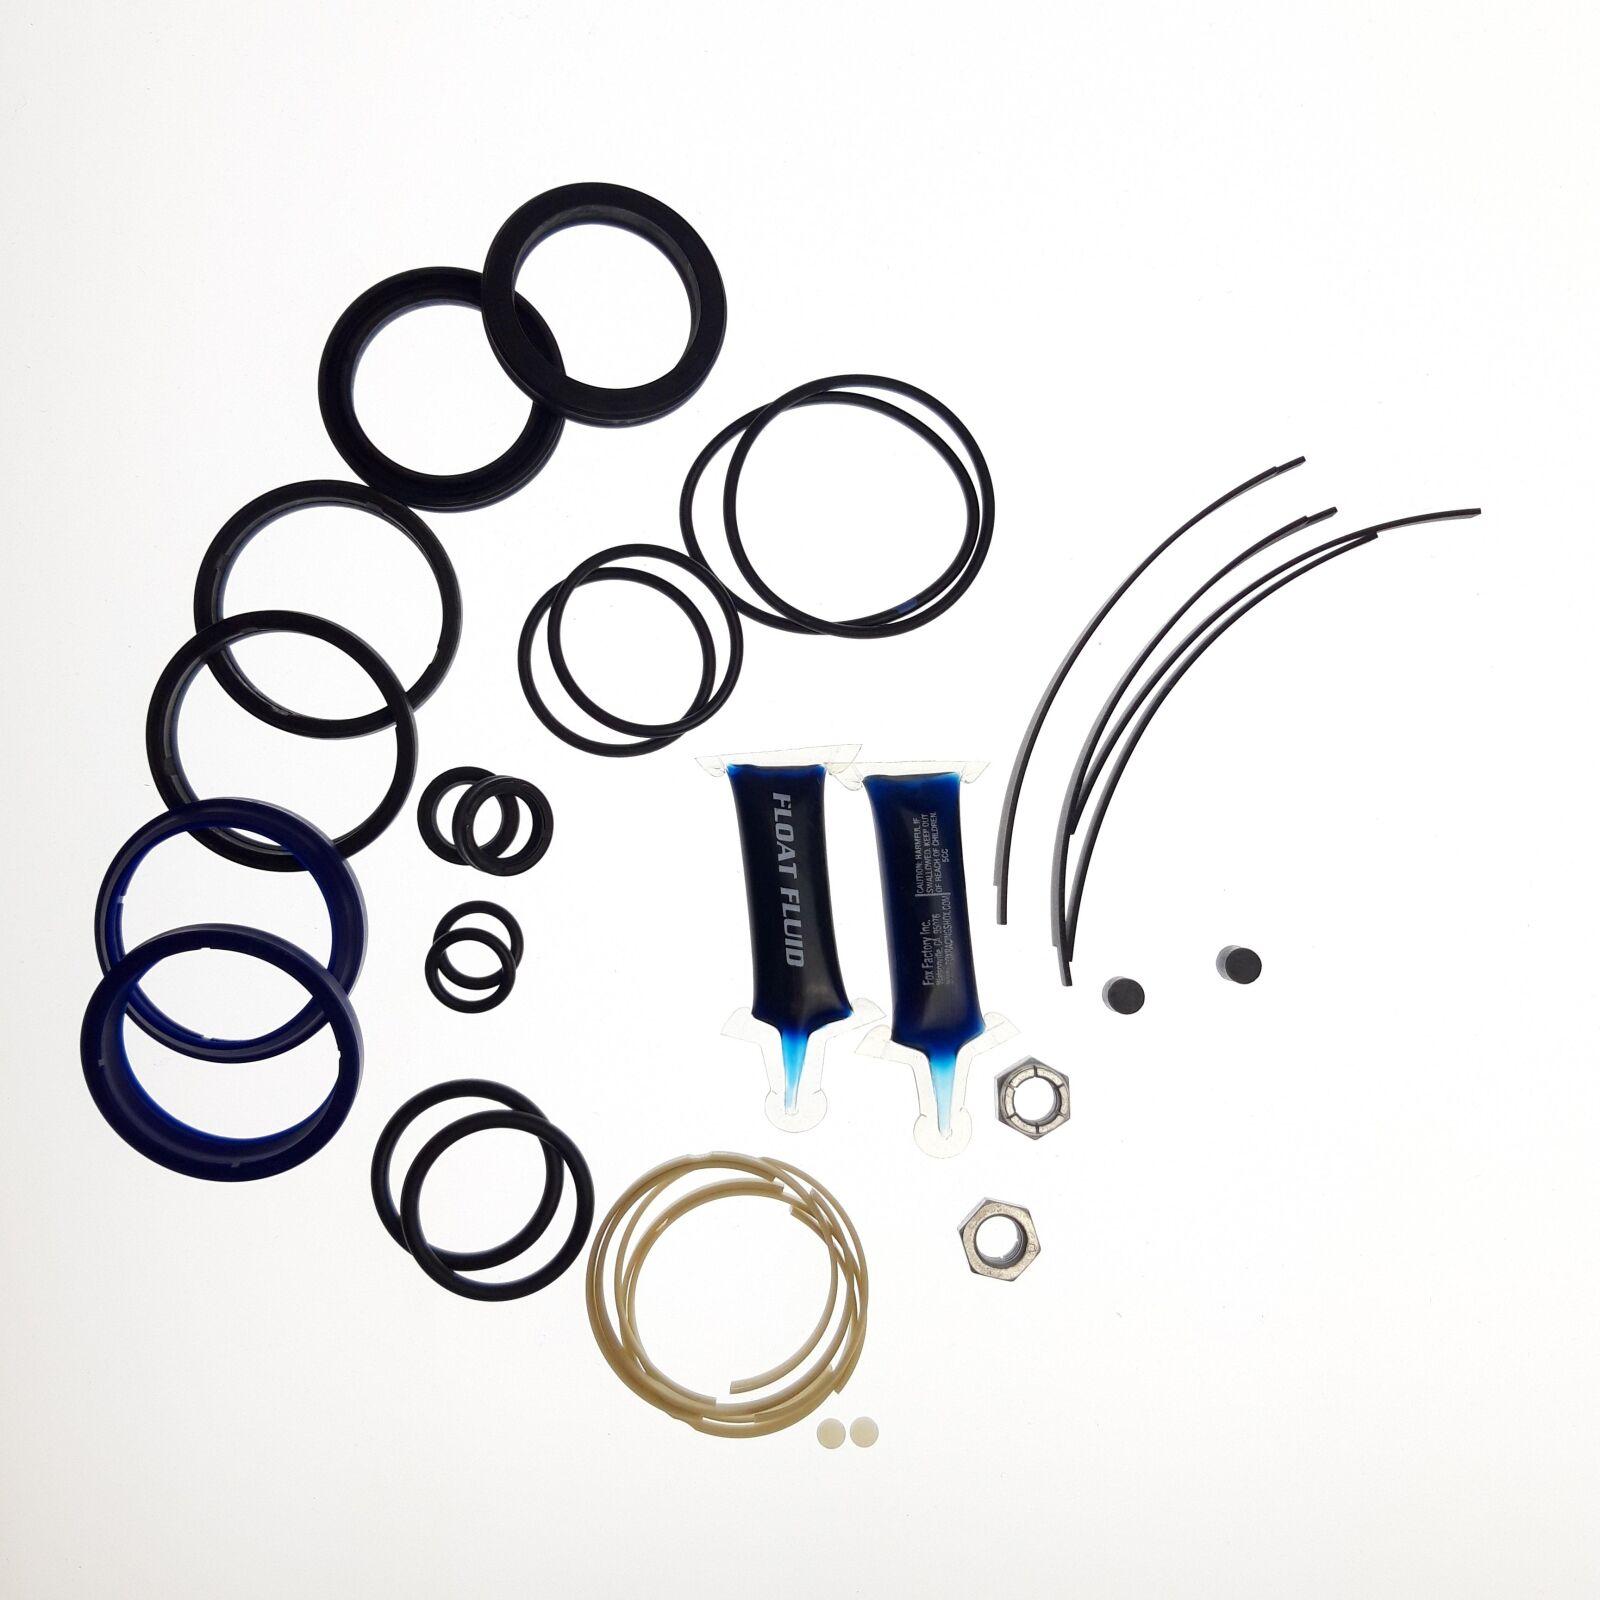 Kit: Rebuild [0.498 Shaft, 1.459 Bore, 1.834 Bore Air Sleeve] FLOAT AirShox